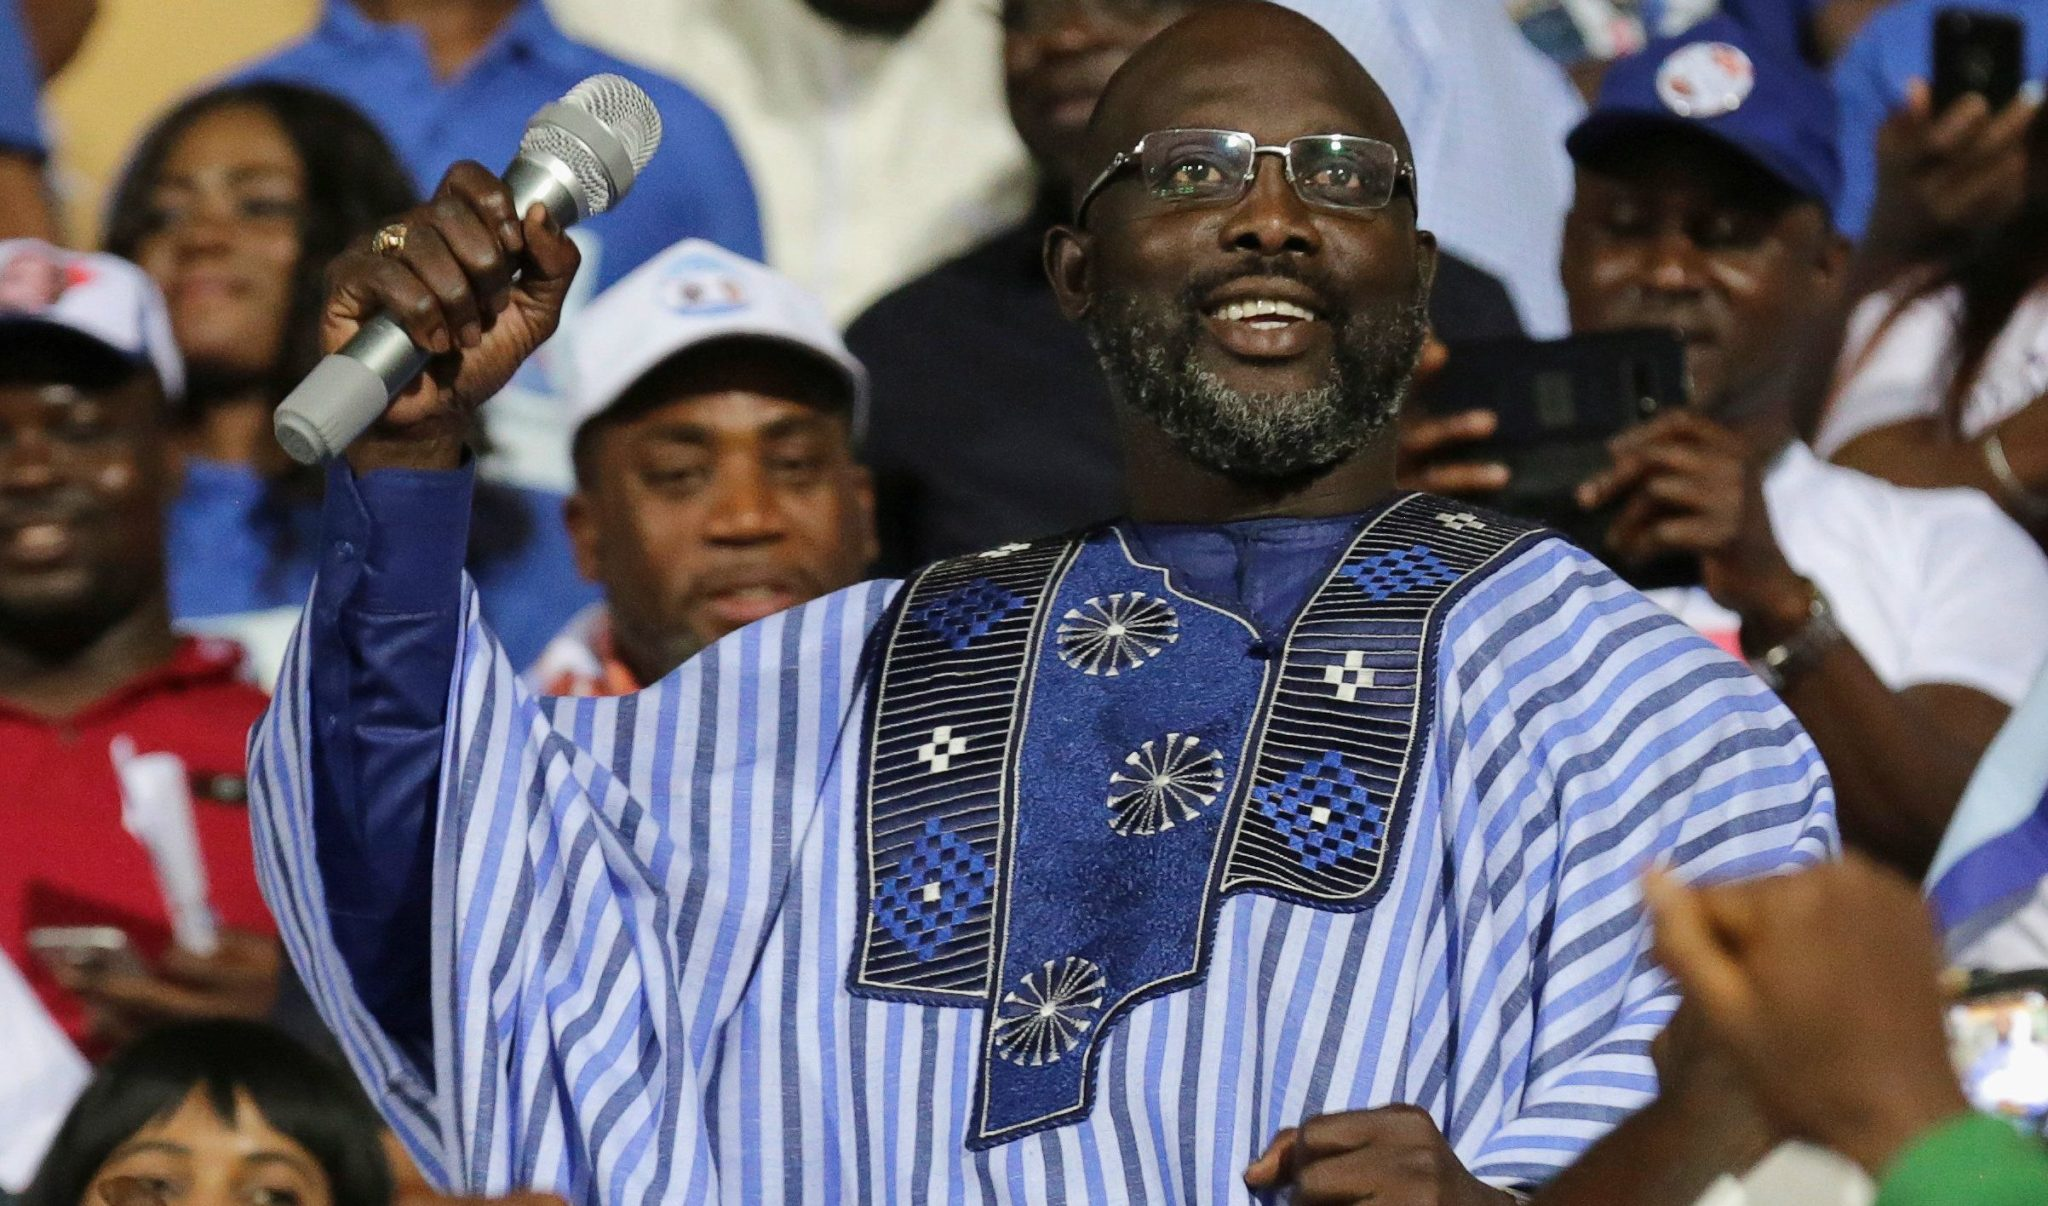 <a class=&quot;amazingslider-posttitle-link&quot; href=&quot;https://www.nextedition.com.ng/news/headline/liberia-agog-weahs-inauguration-president/25452/&quot;>Liberia agog for Weah's inauguration as President</a>